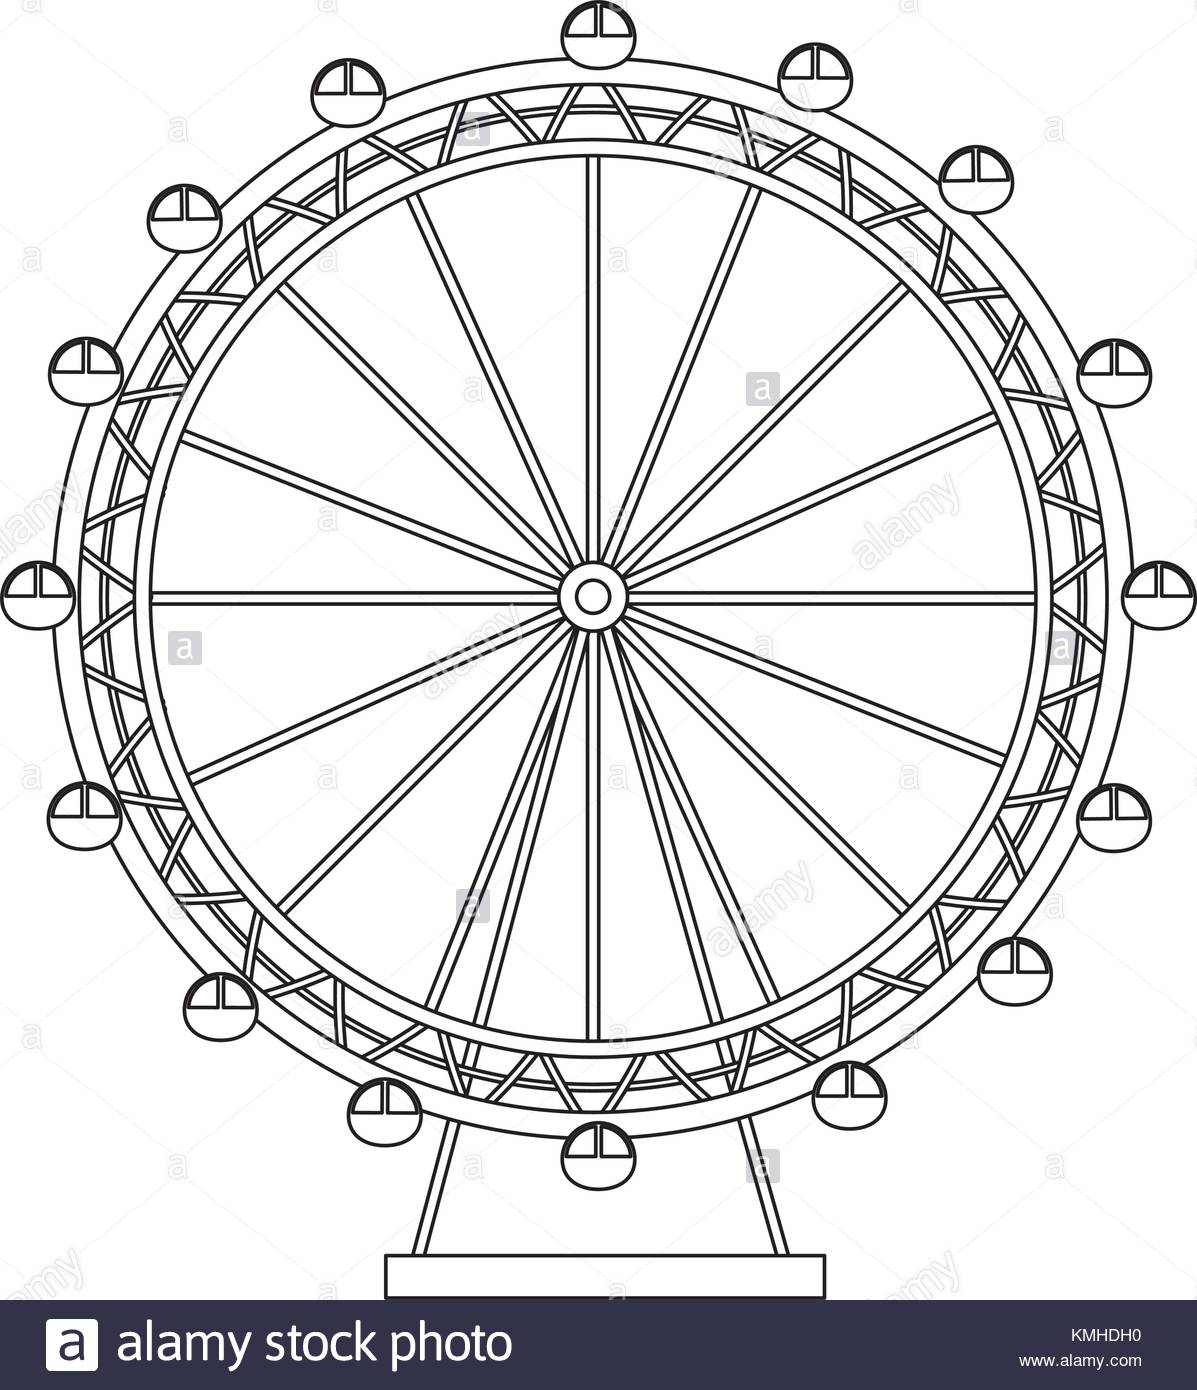 1197x1390 Ferris Wheel Recreation Adventure Landmark Stock Vector Art